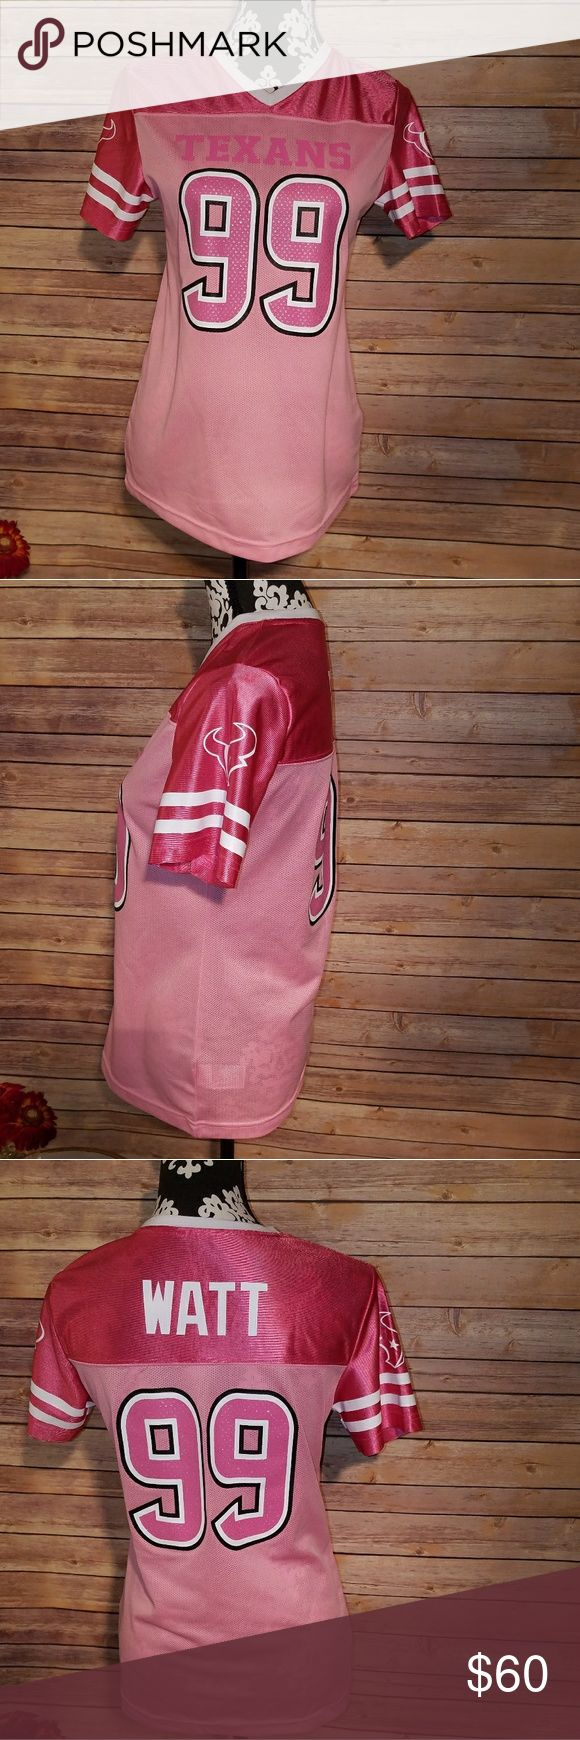 Houston Texans bling pinkjersey Perfect for football season. Pink  JJ Watt Houston Texans jersey. Size xlarge. Runs small like a small/medium. NFL Team Apparel Tops Tunics